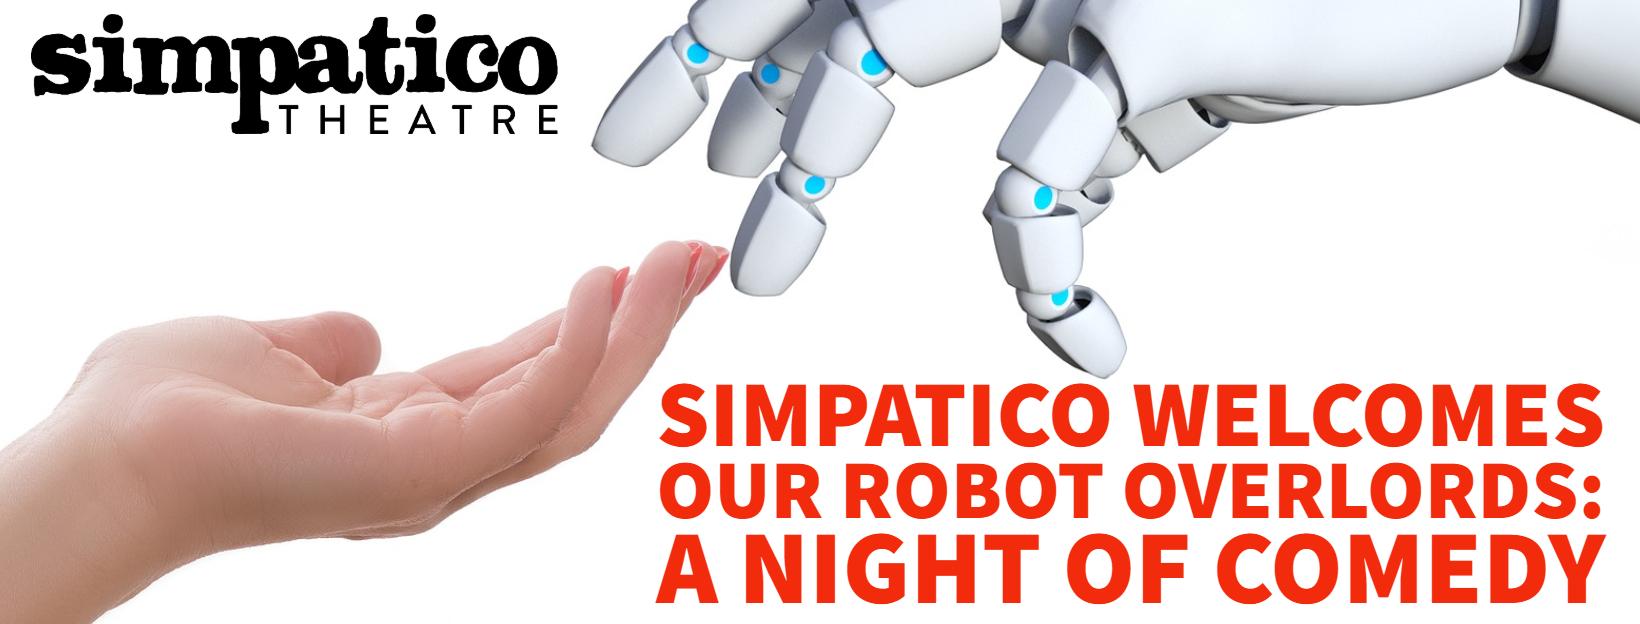 SimpaticoRobot2.0_FacebookCover.jpg